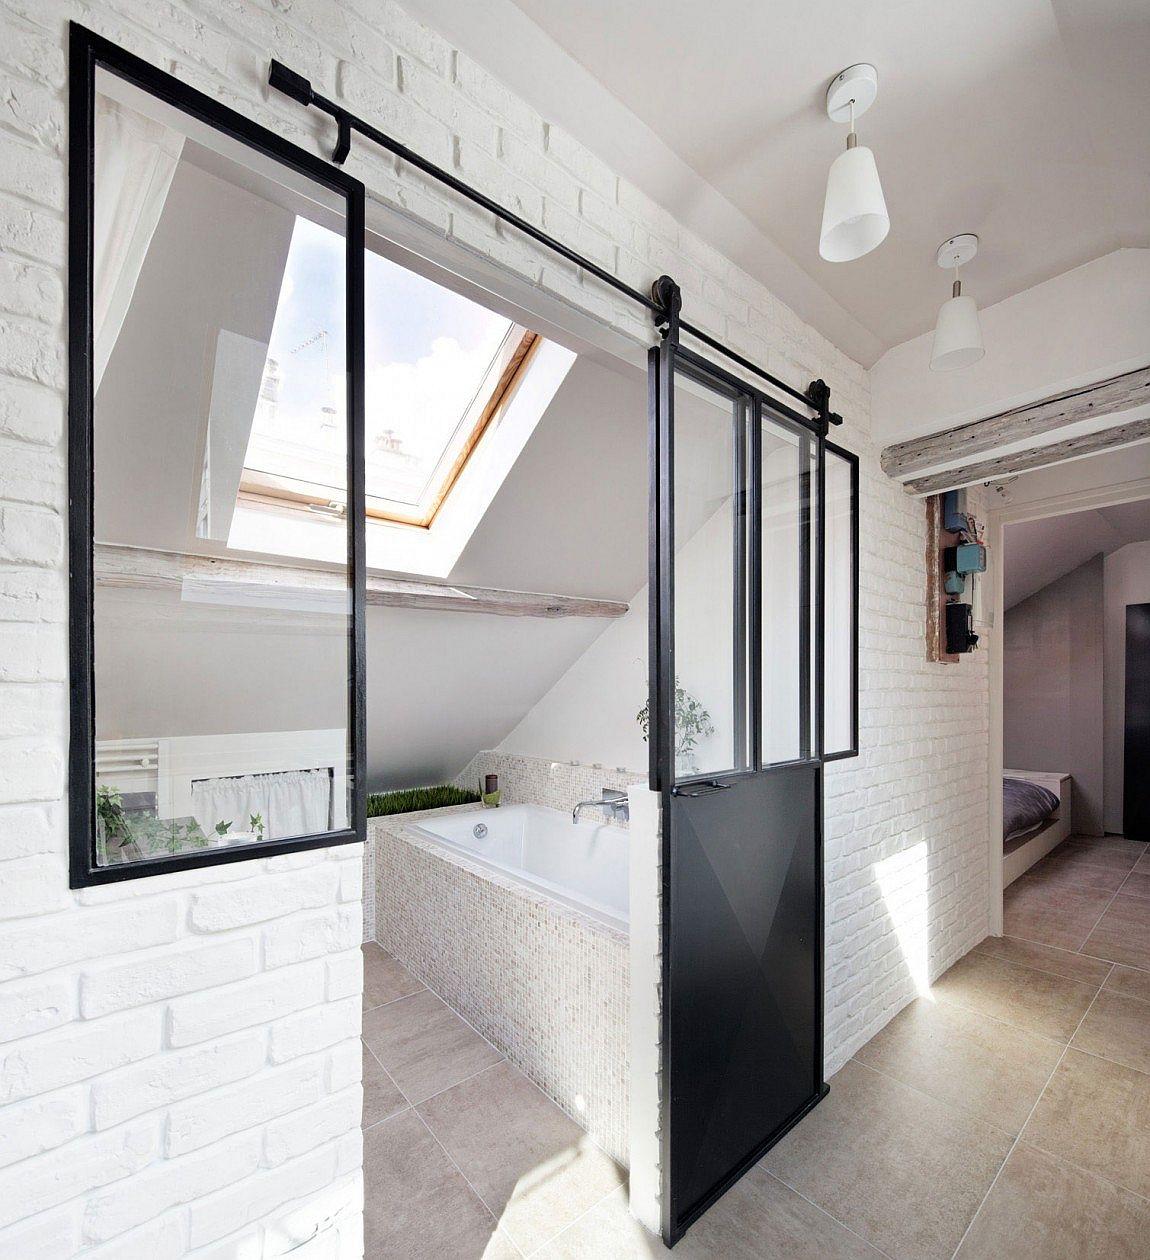 Small bathroom design full of sunlight